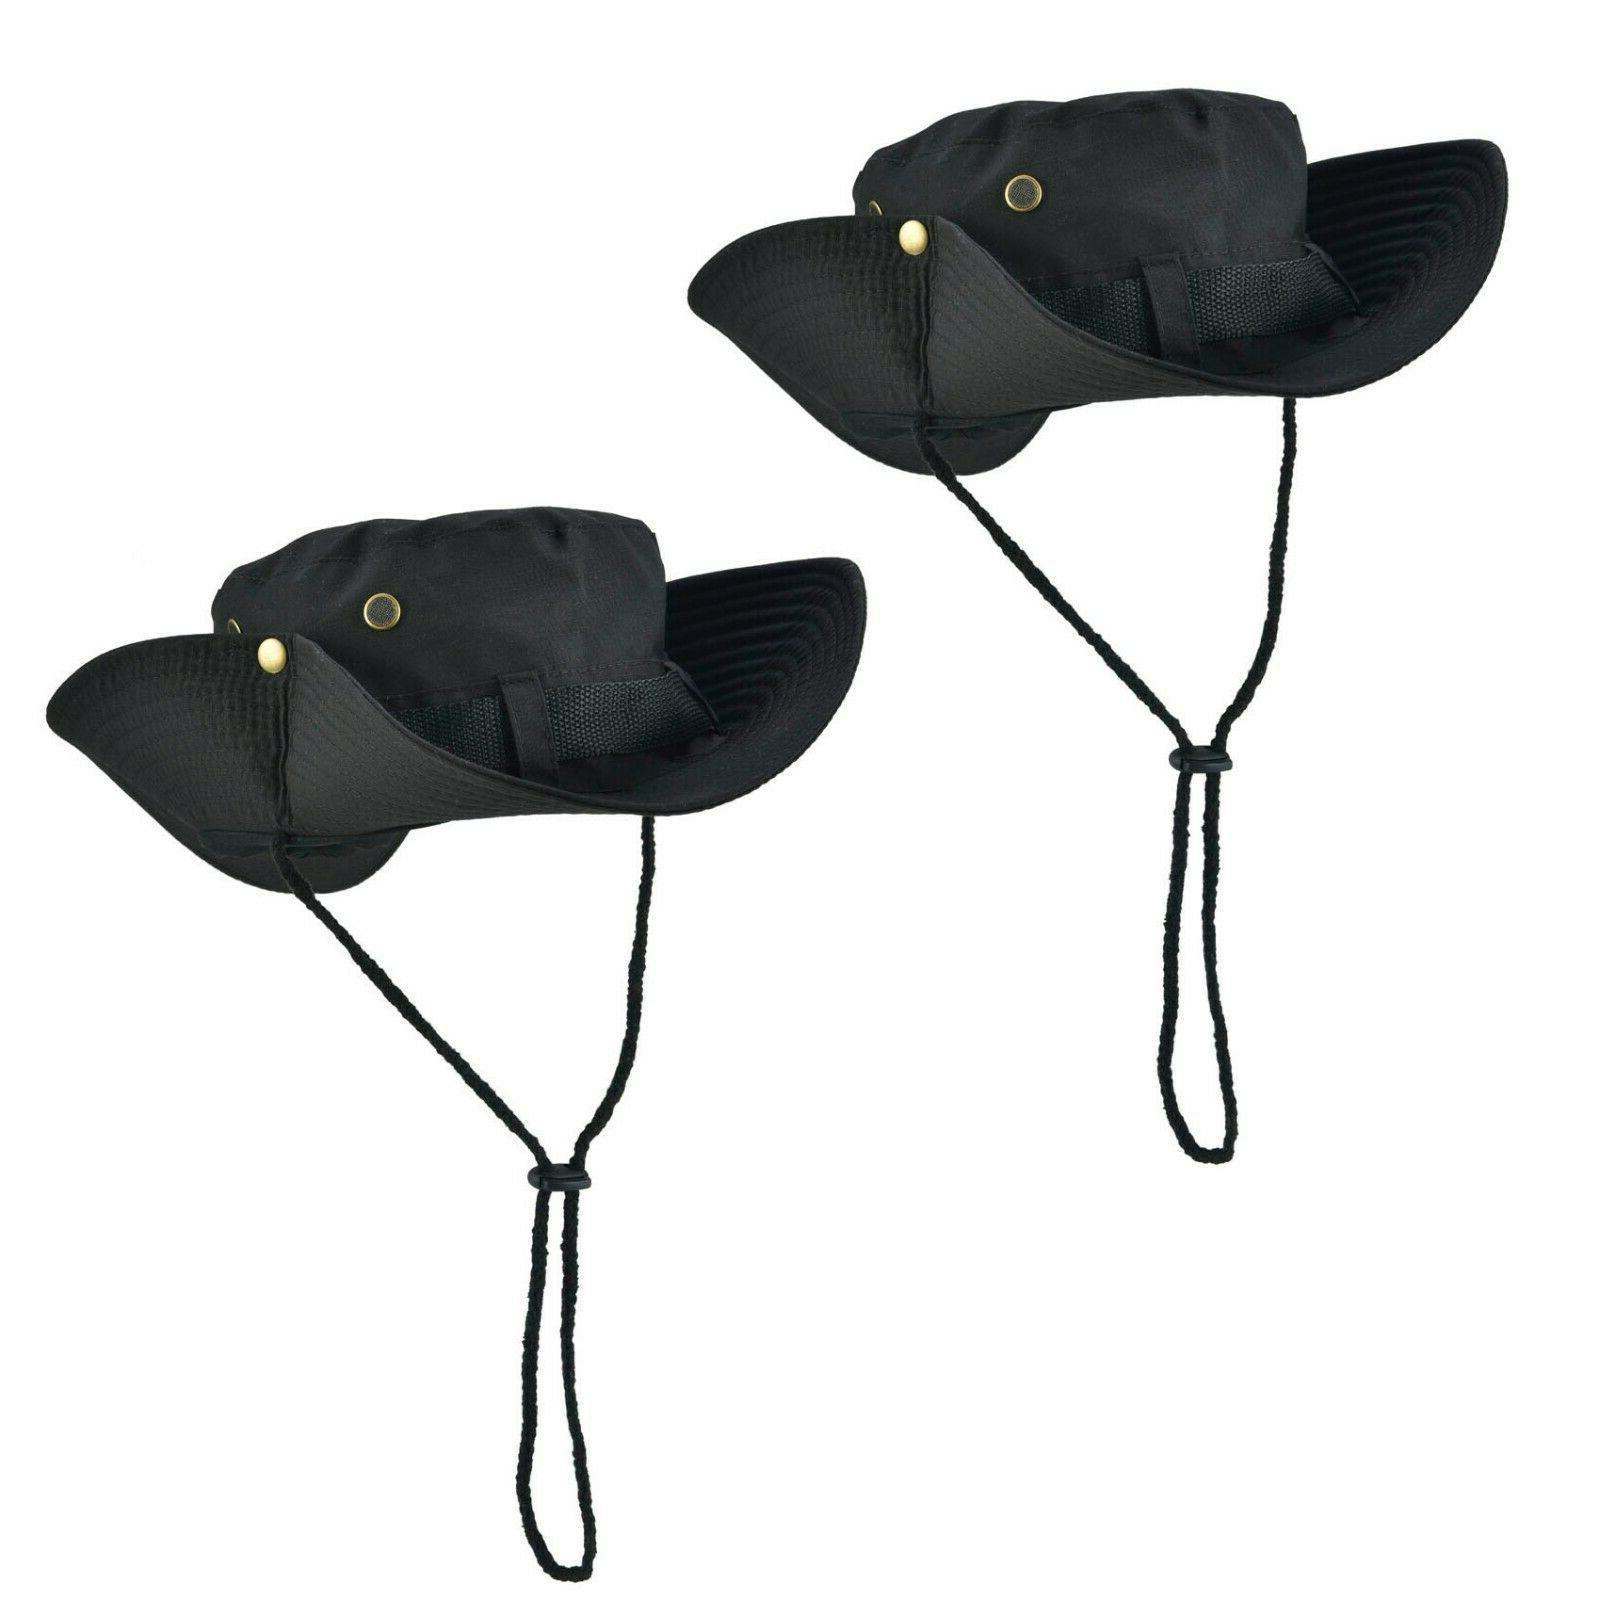 Boonie Bucket Outdoor Fishing Wide Mesh Camo Safari Cap